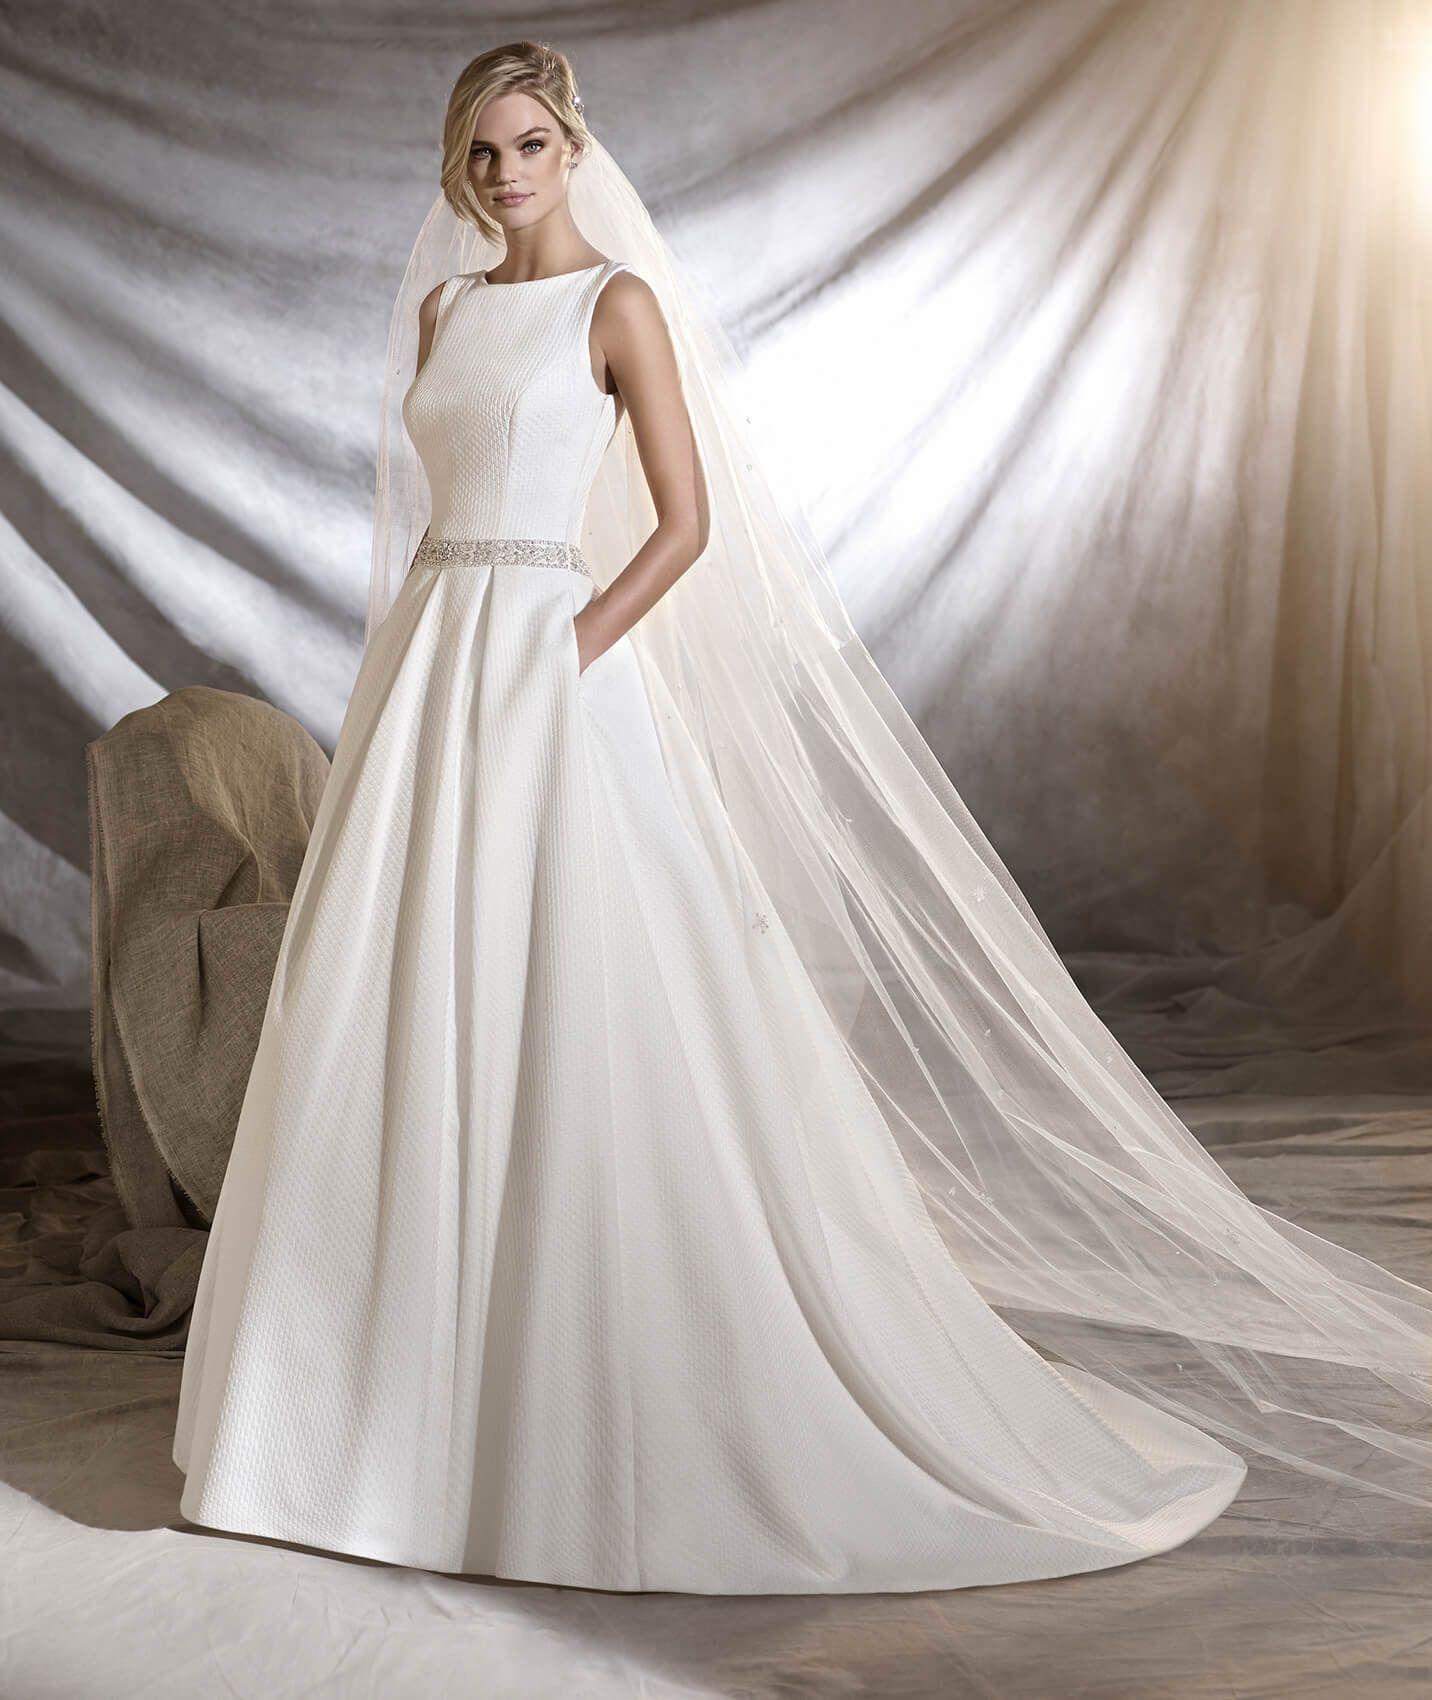 7937e610ea8 Pronovias Wedding Dresses Sale Uk - Data Dynamic AG